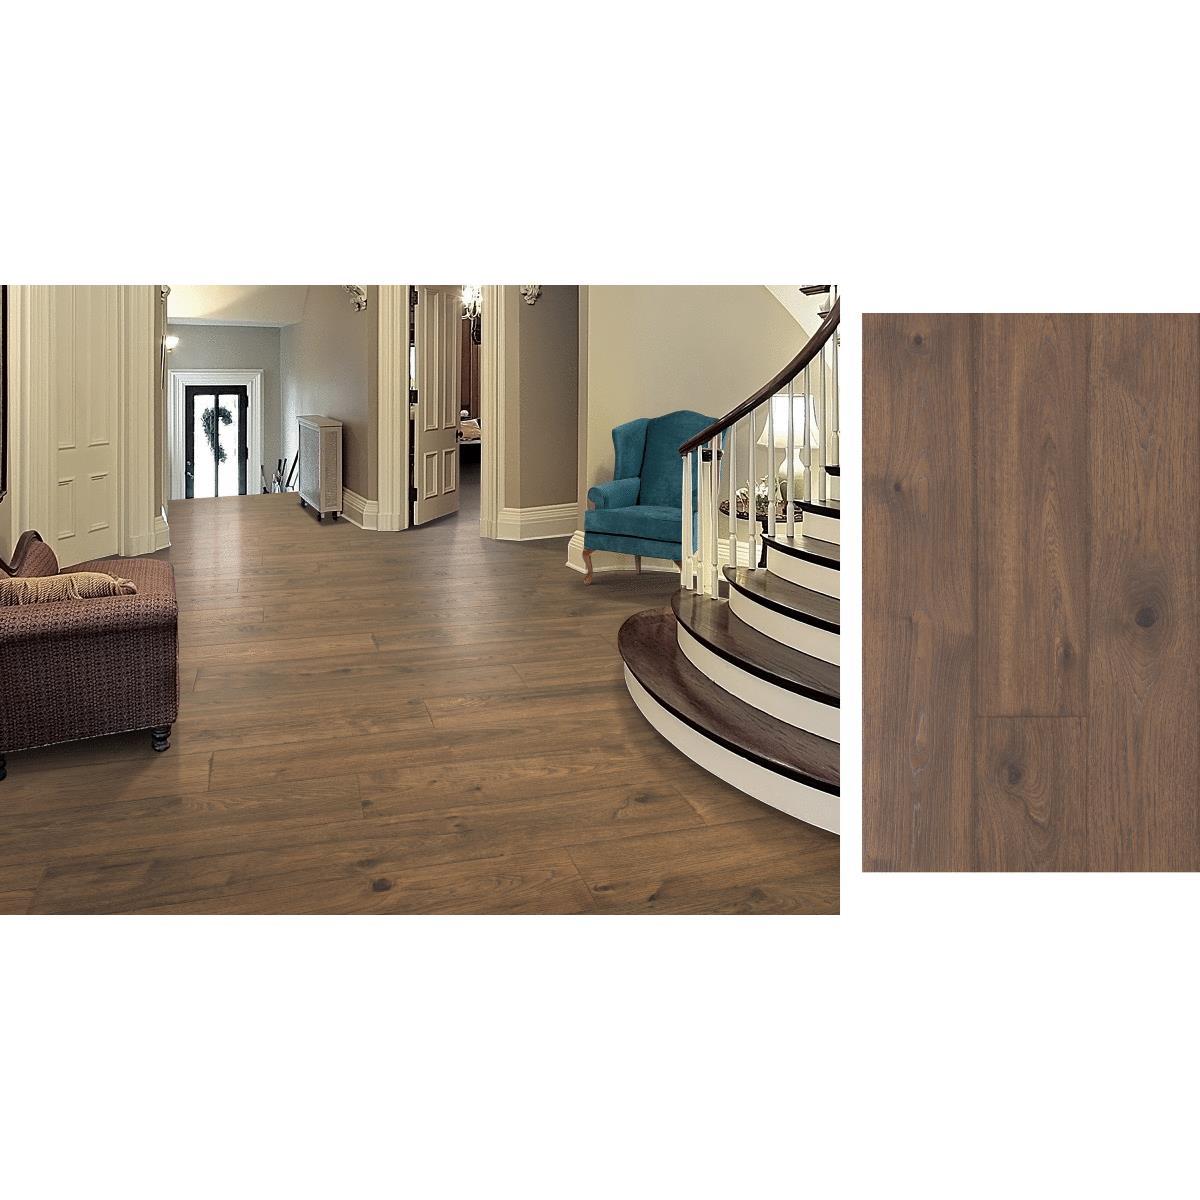 Mohawk Revwood Plus Elderwood Waterproof Wood Flooring Bungalow Oak